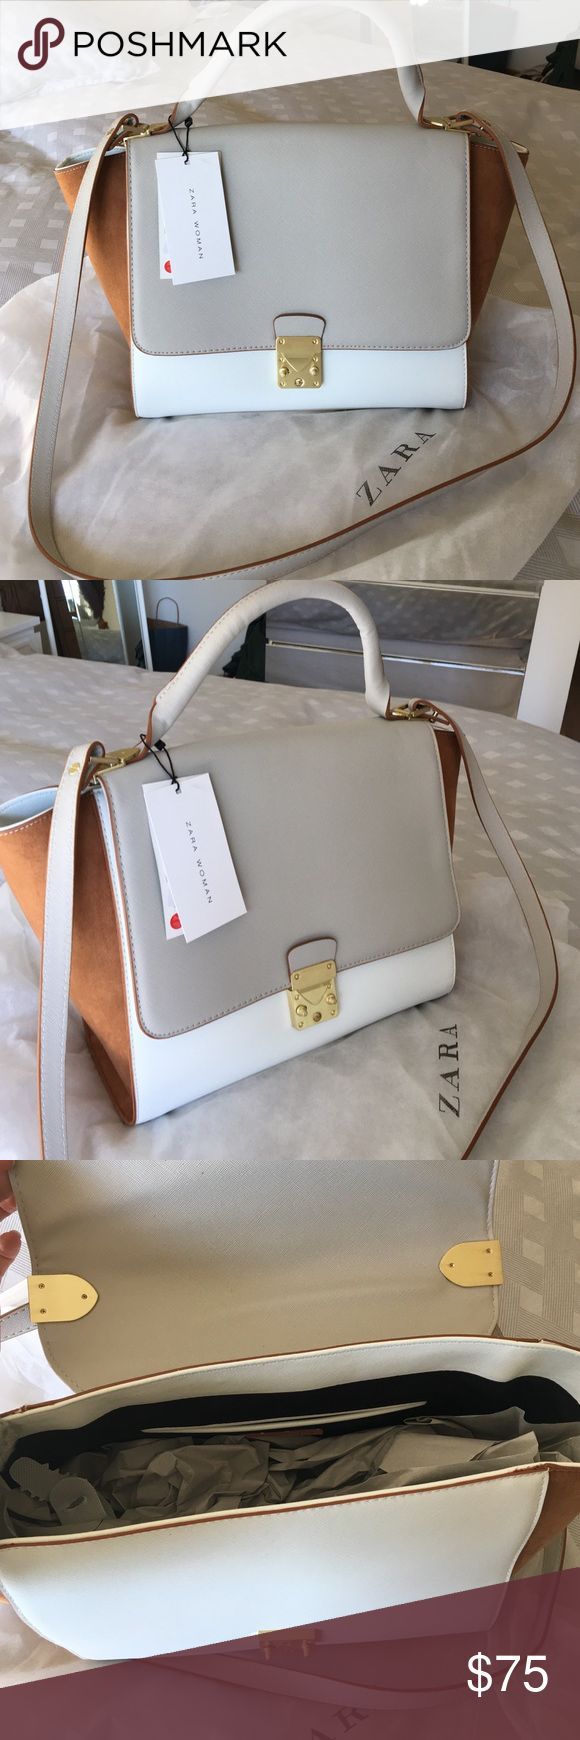 NWT Zara crossbody or shoulder handbag with strap. NWT gorgeous two tones Zara handbag. Can be worn on shoulder and crossbody. Never worn. Zara Bags Crossbody Bags